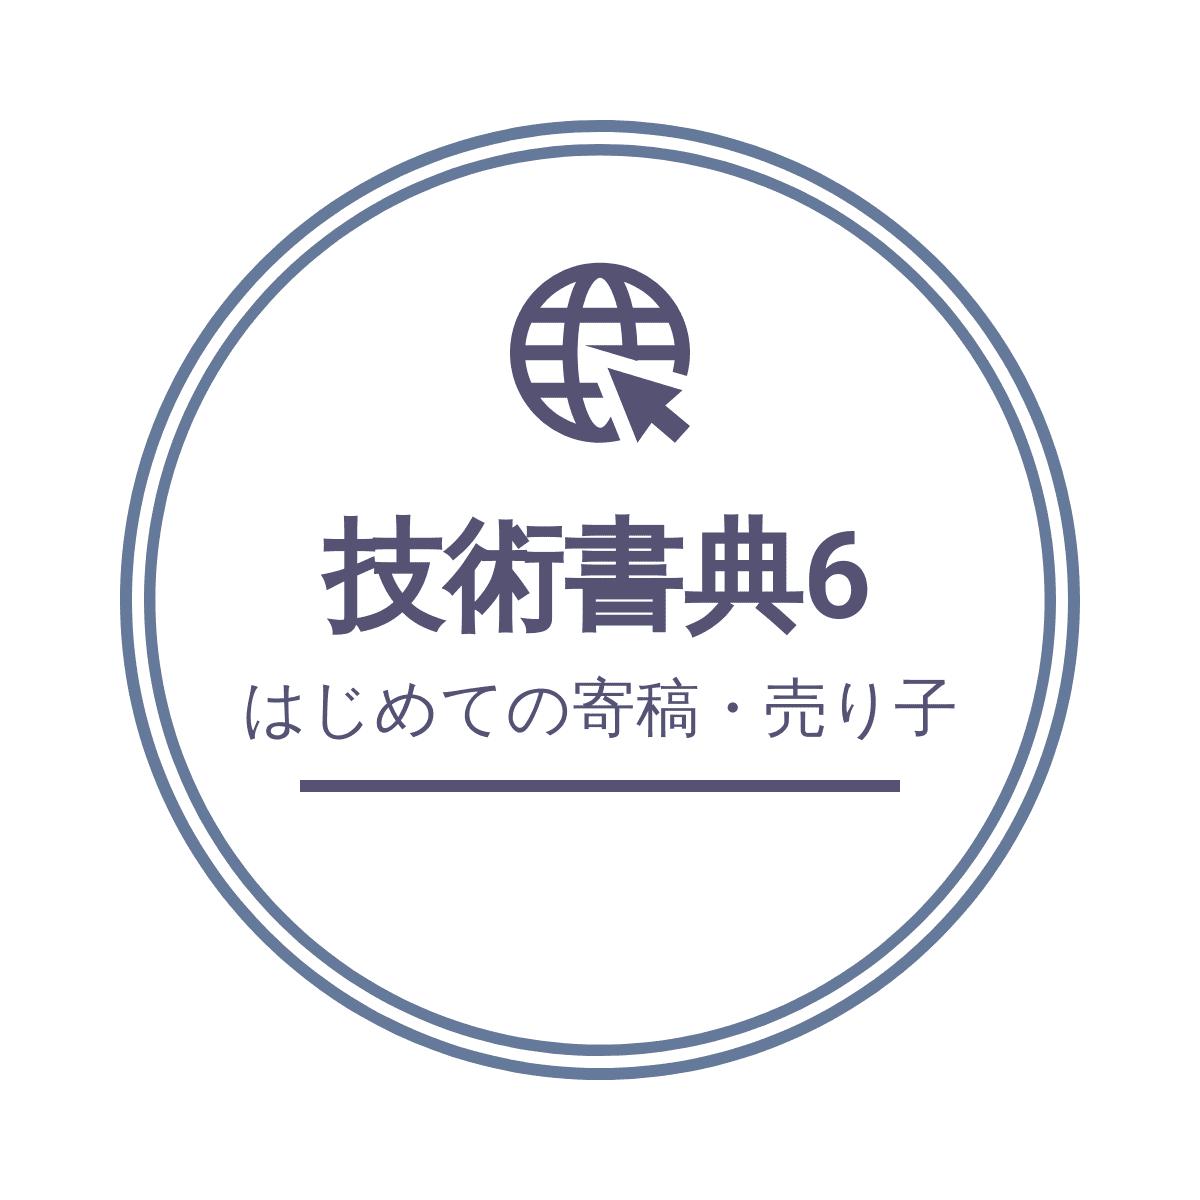 f:id:kic-yuuki:20190420100749p:plain